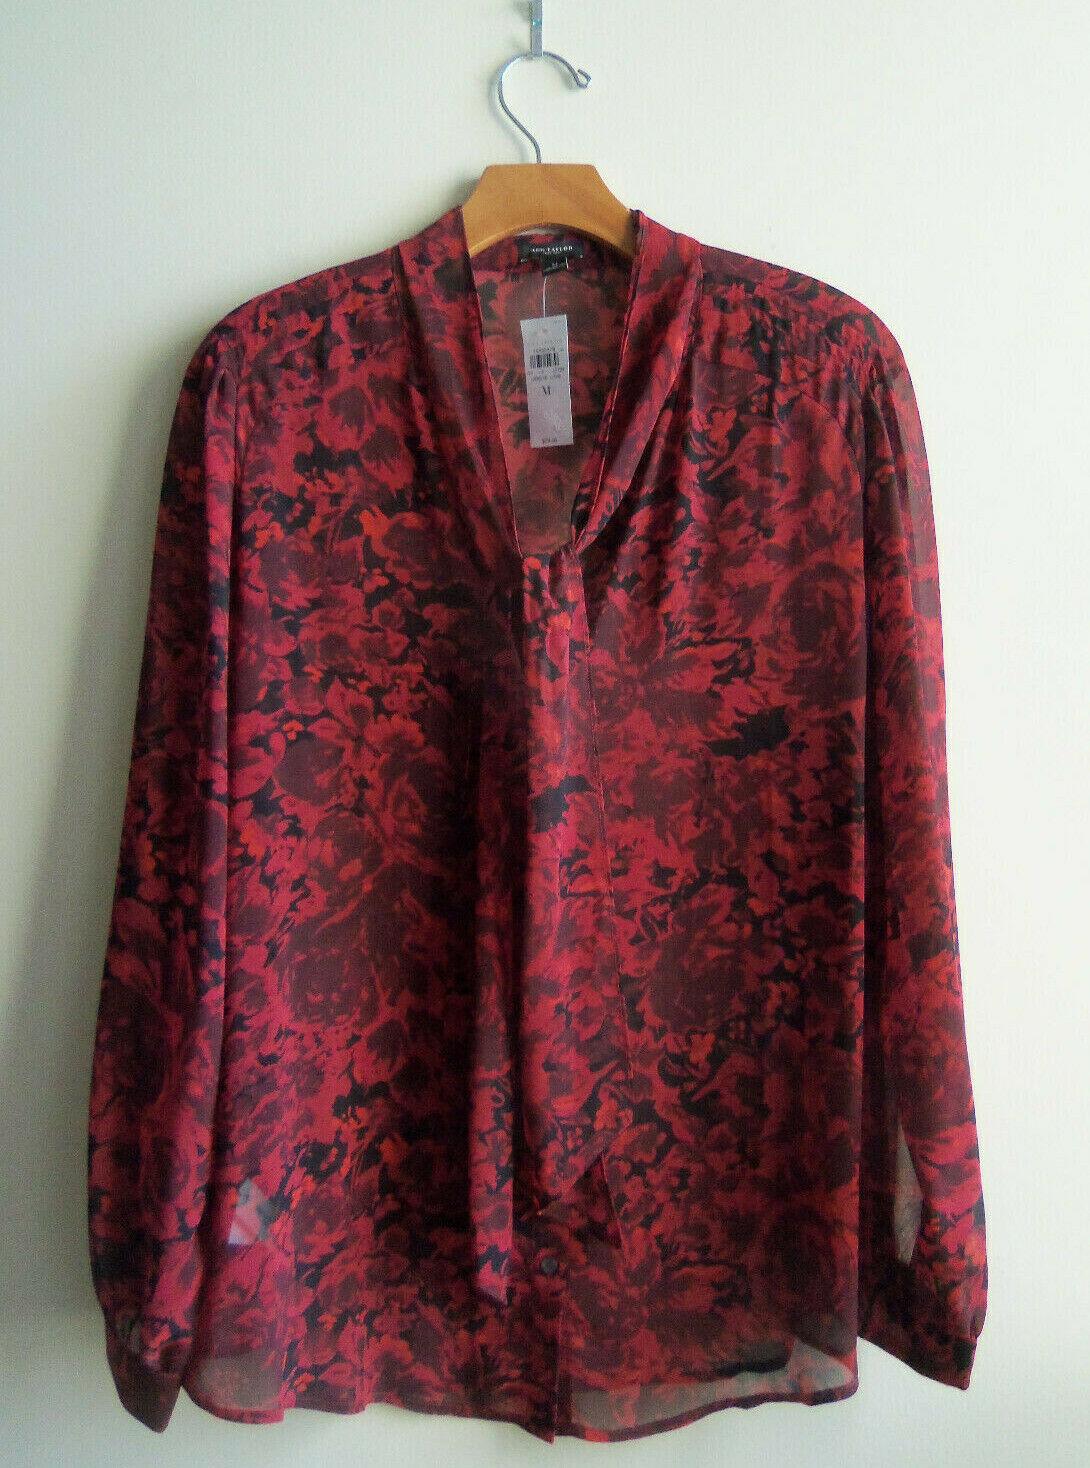 Ann Taylor Floral Tie Neck Shirt, 100% Polyester, rot Print, Größe M, NWT